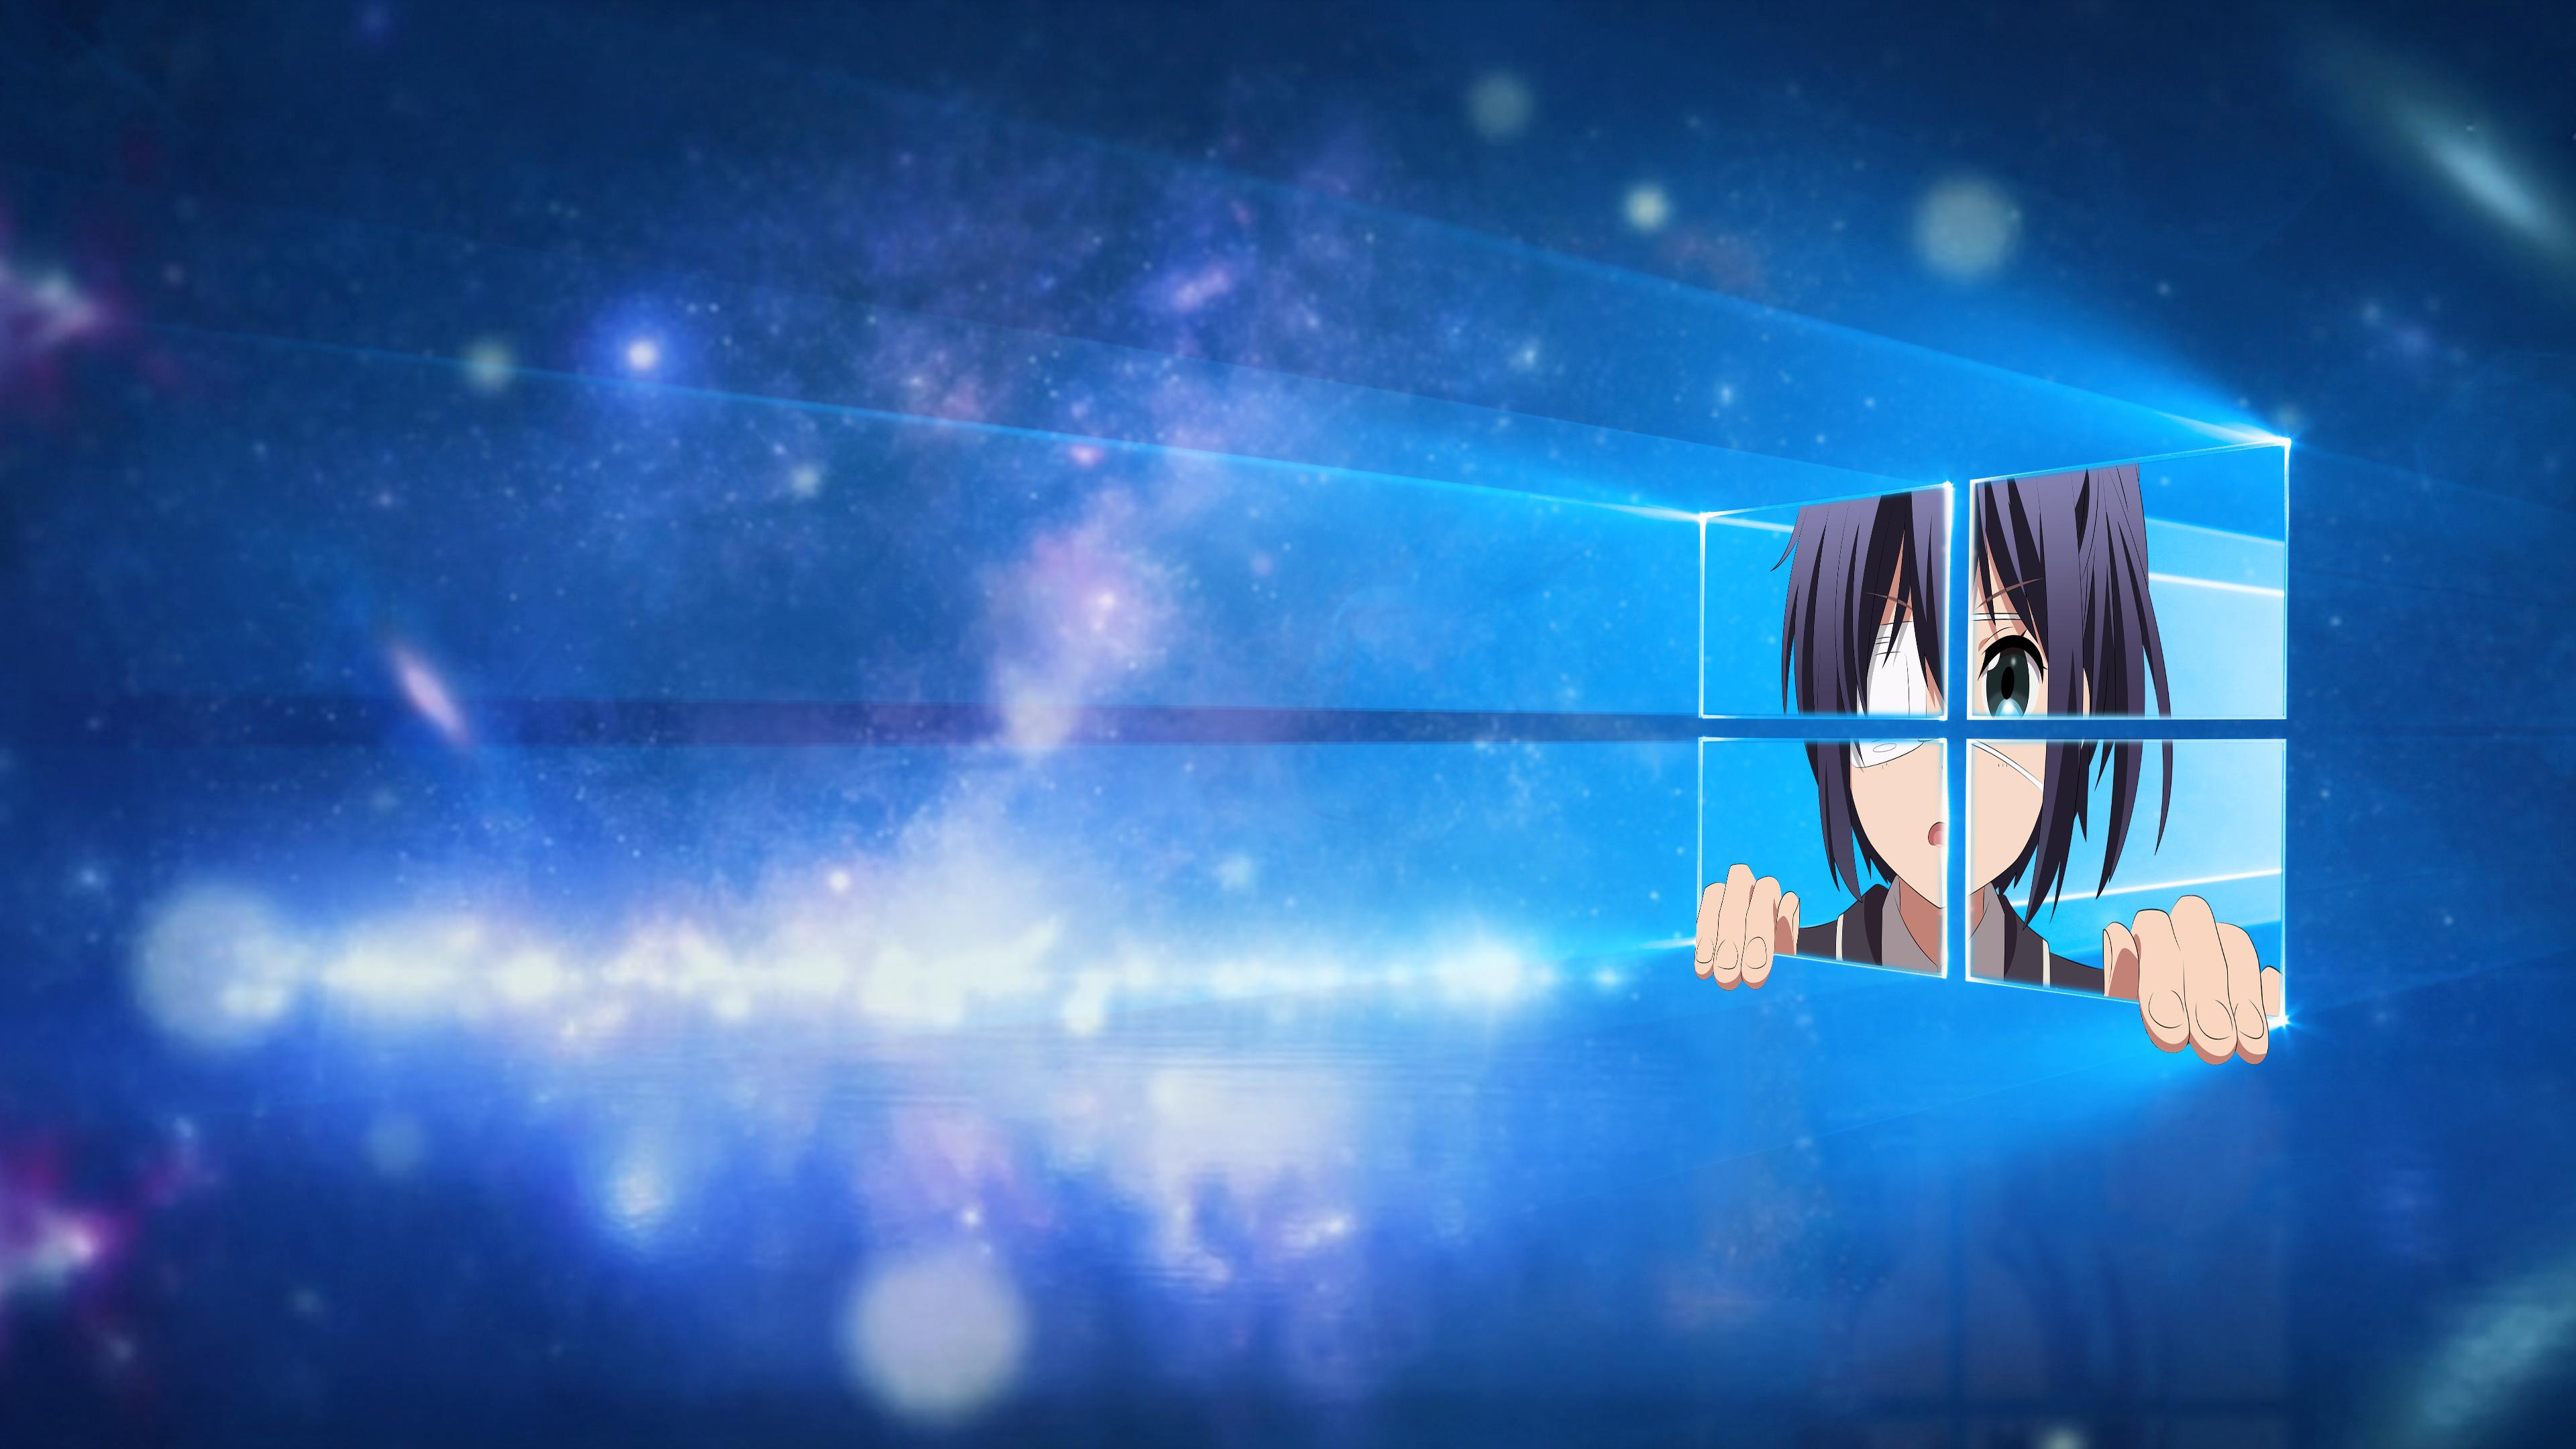 Windows Anime Background 3840x2160 Anime Wallpaper Wallpaper Windows 10 Anime Background